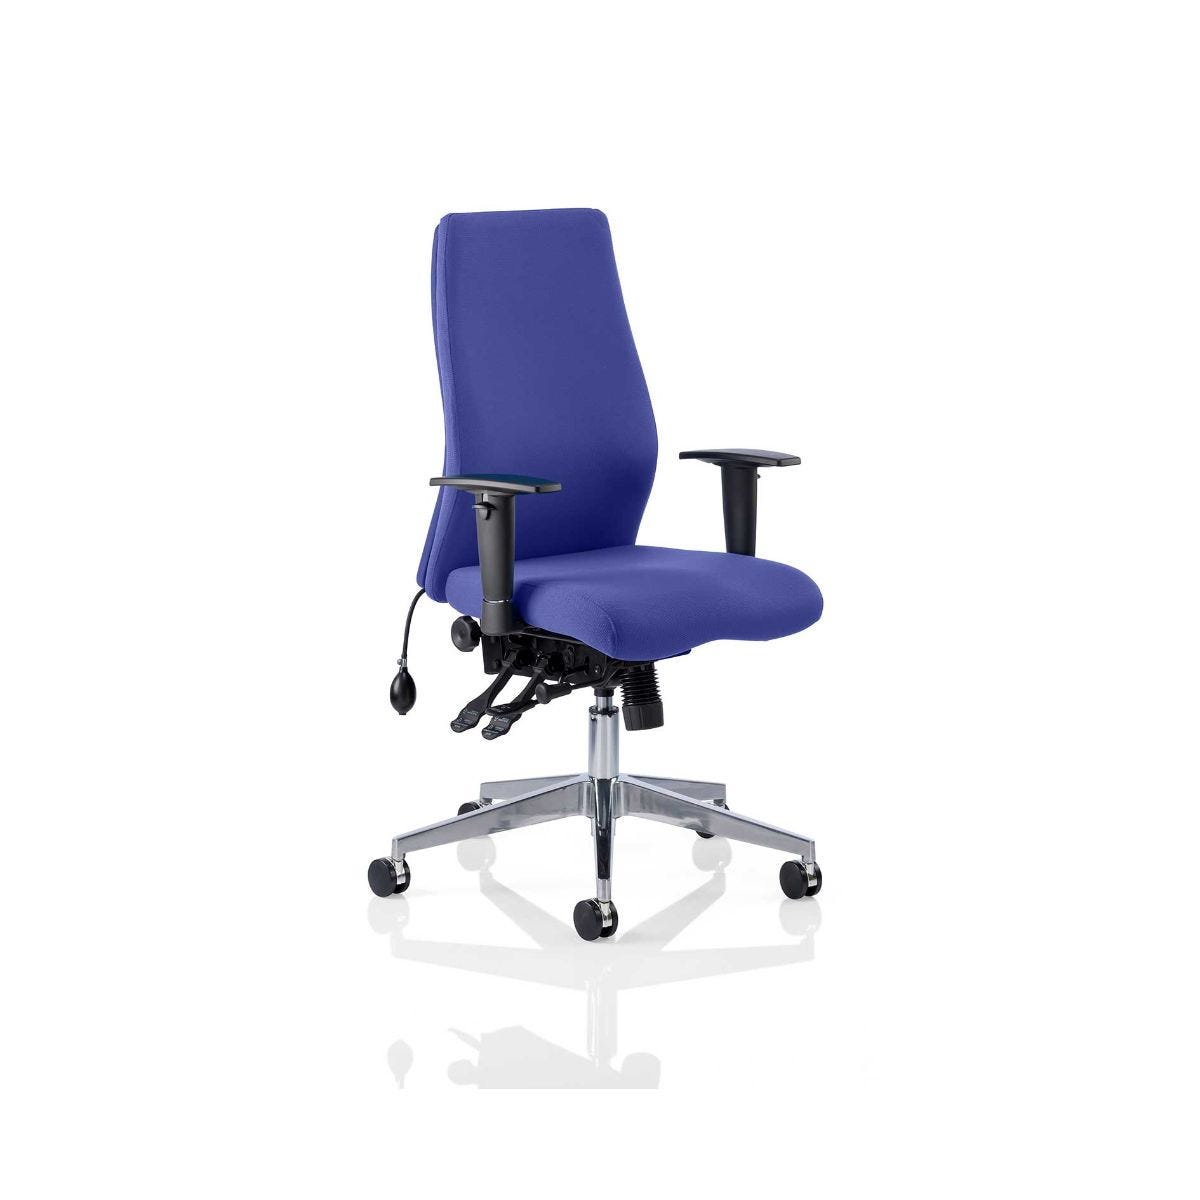 Onyx Bespoke Office Chair, Stevia